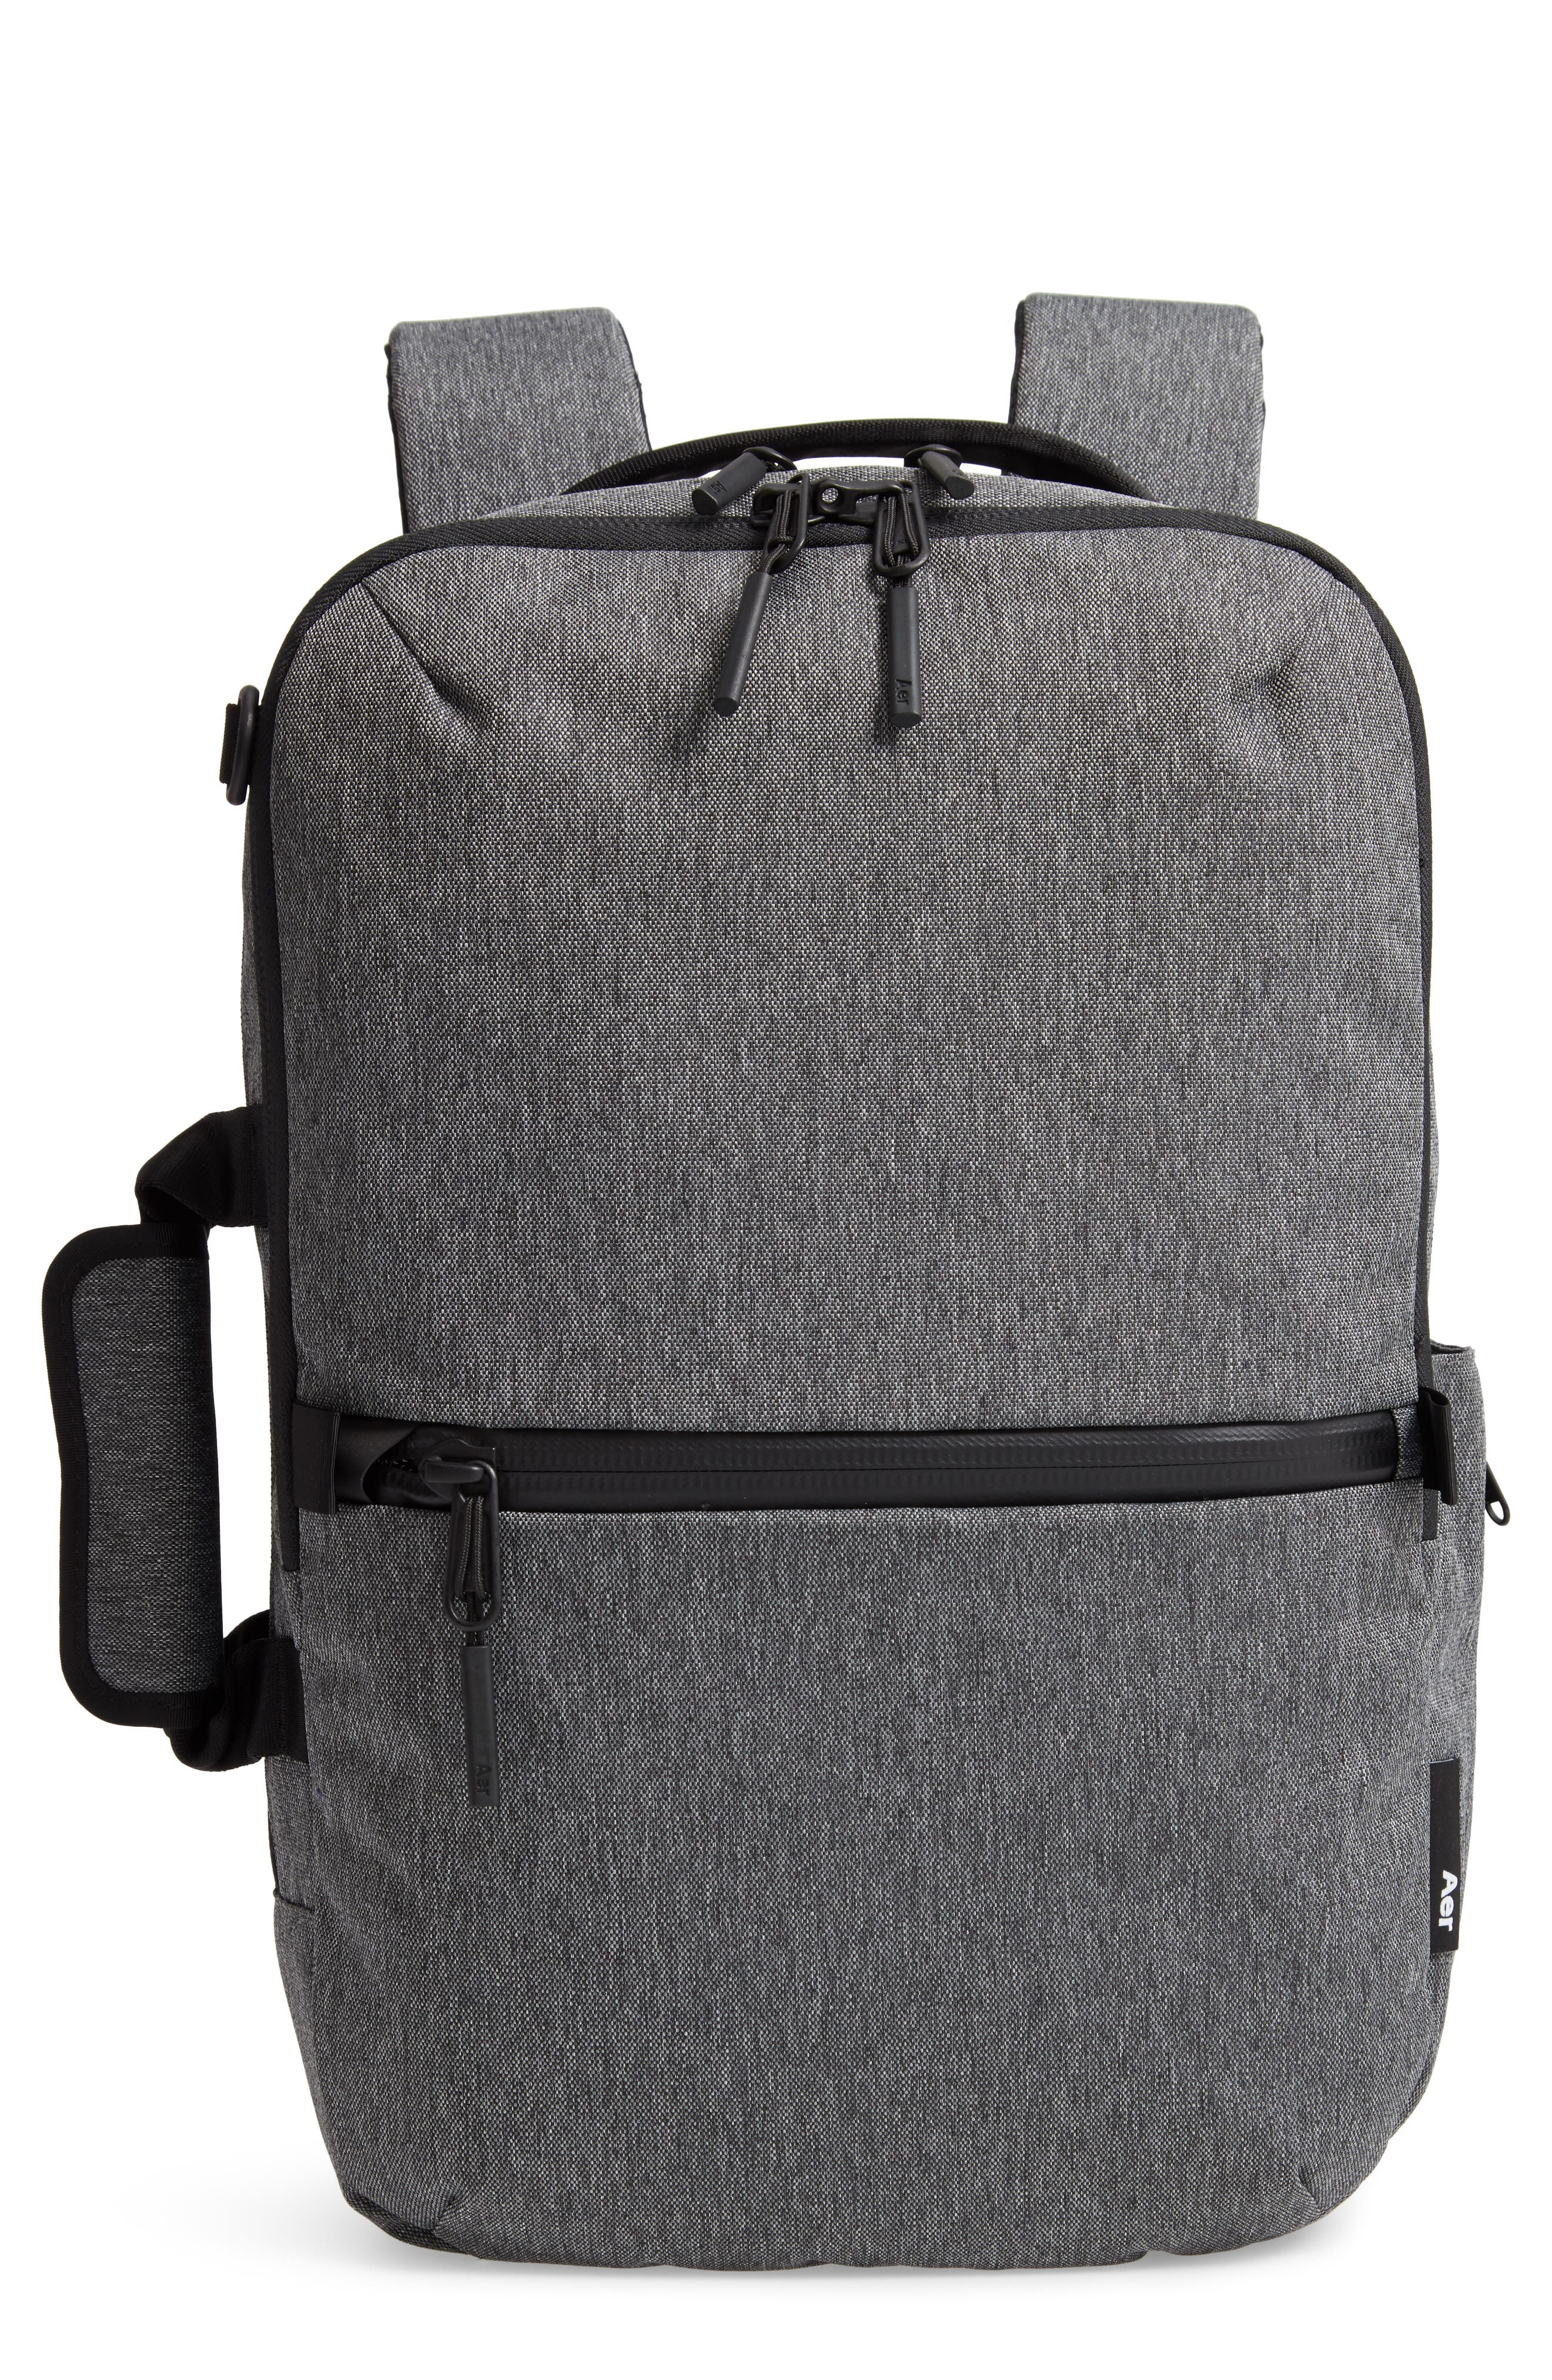 Flight Pack 2 Backpack,                             Main thumbnail 1, color,                             020